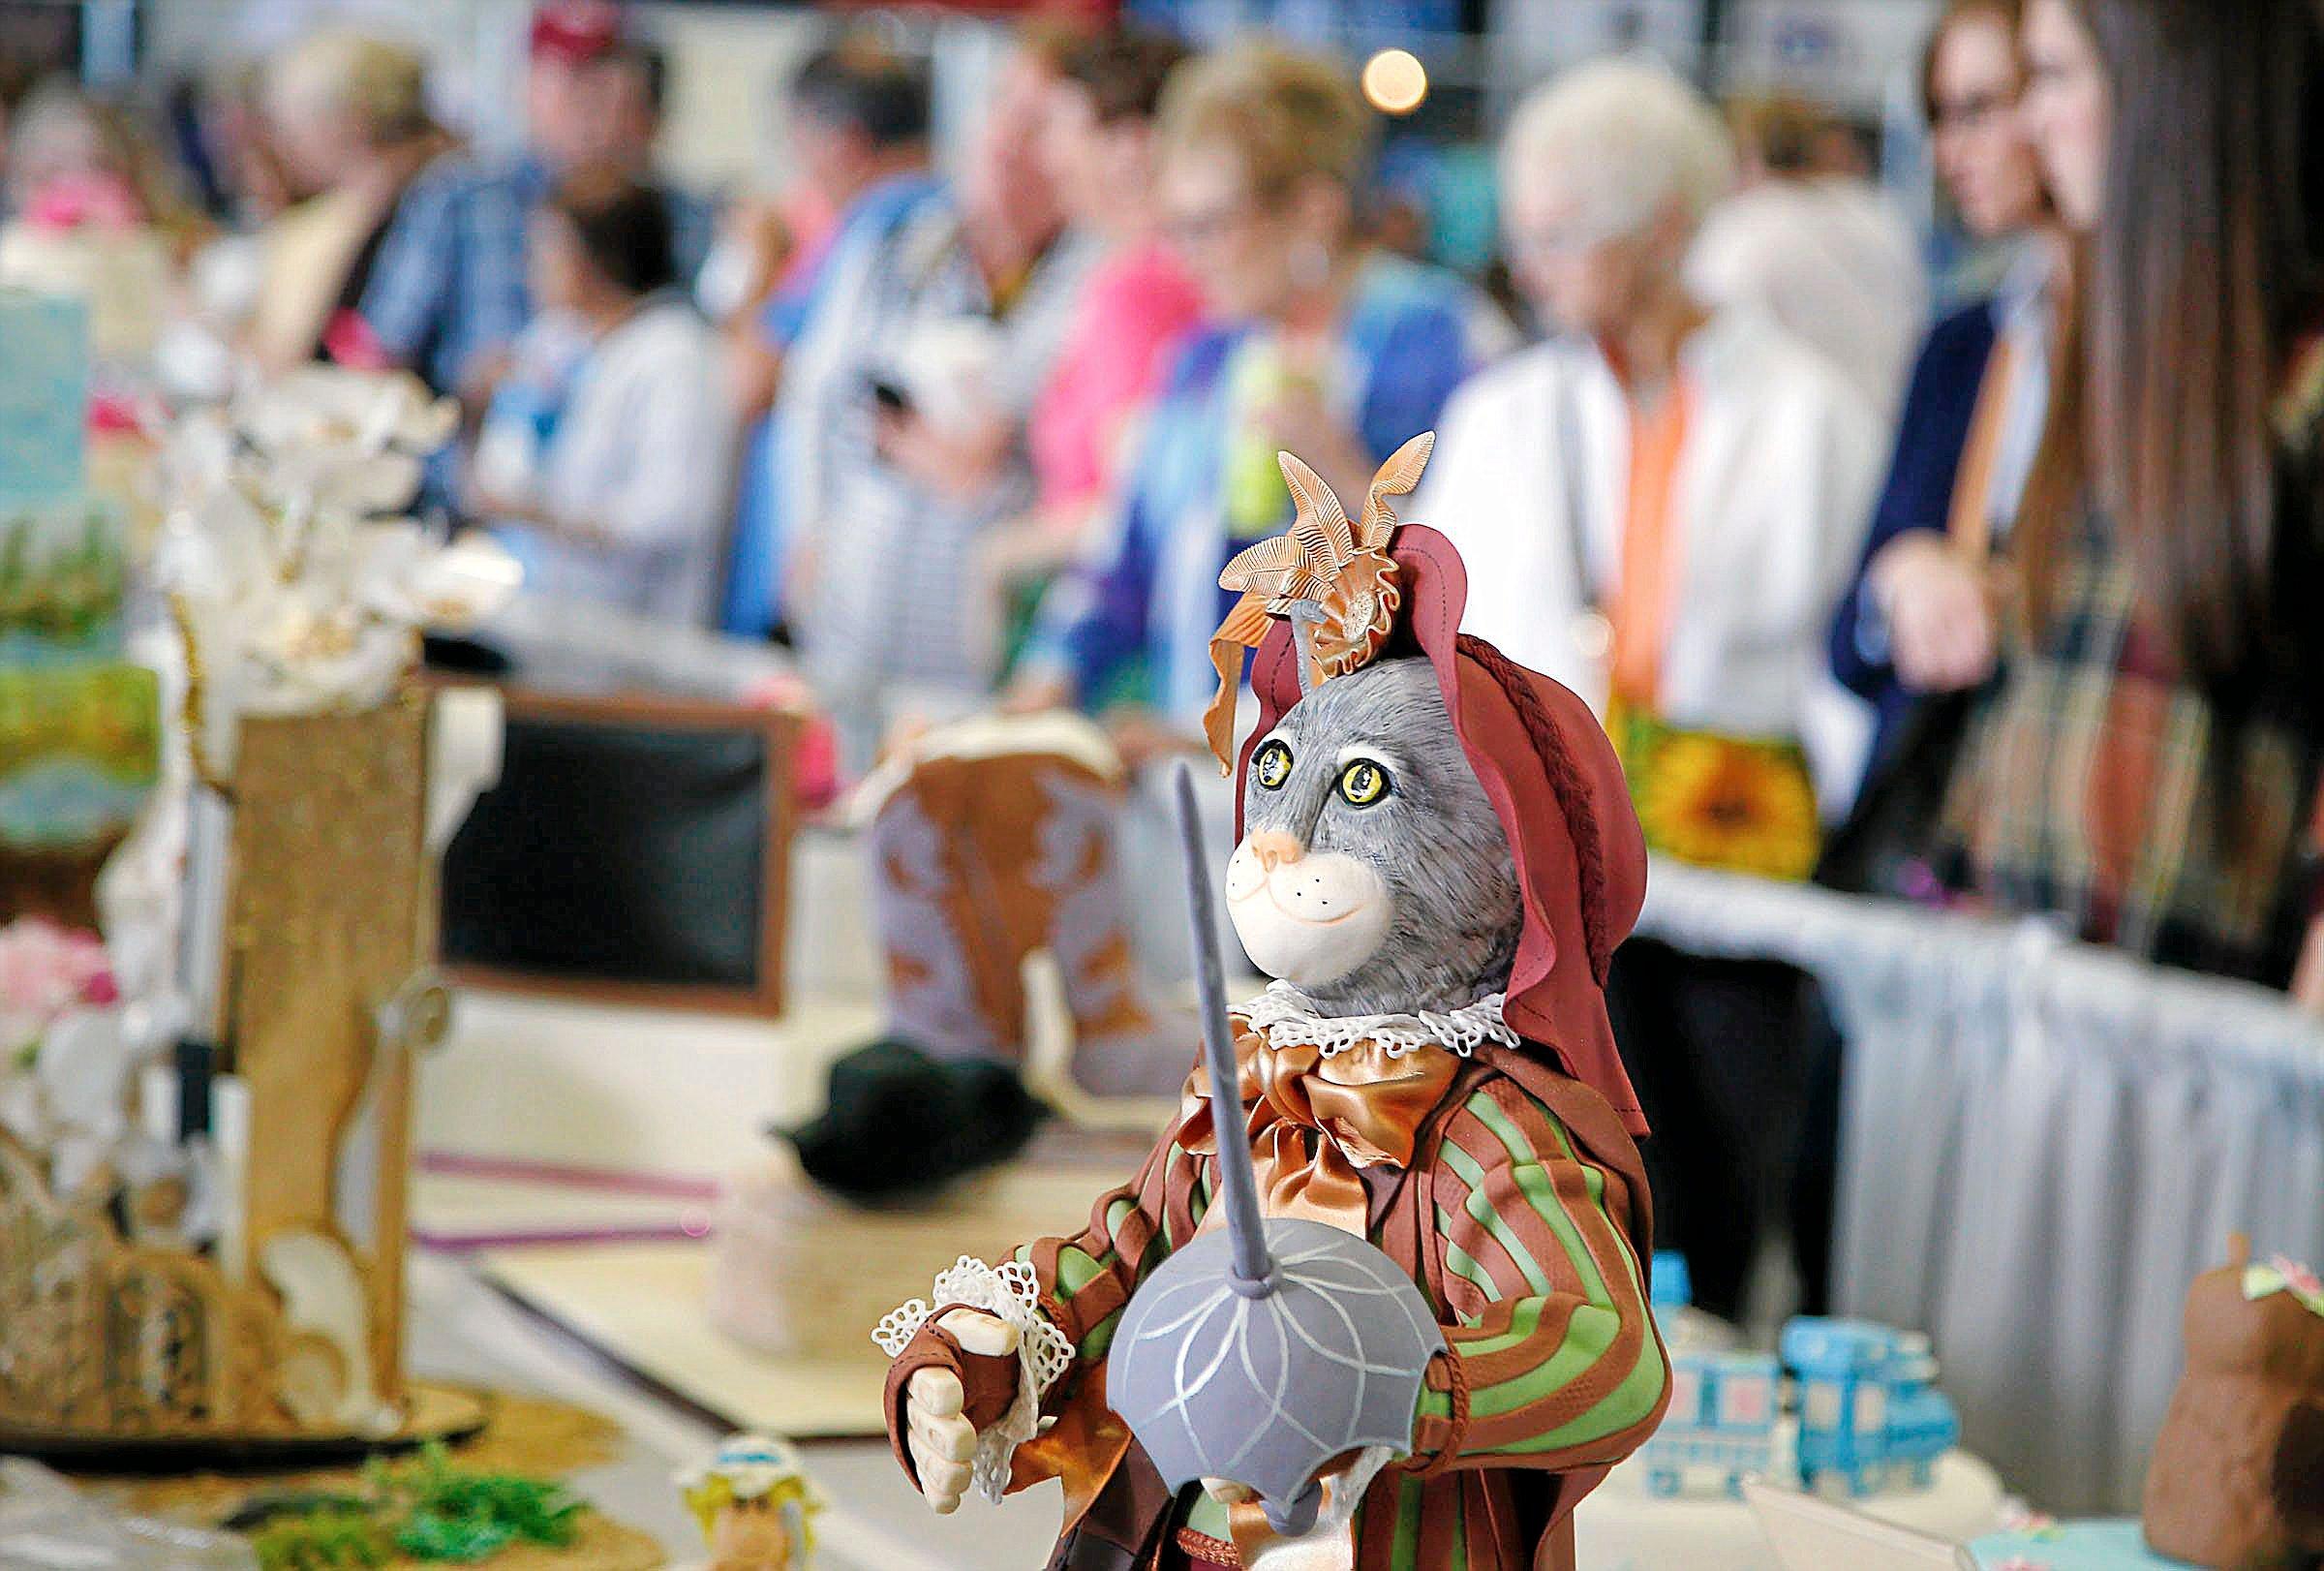 Photo gallery: Sugar Art Show at the Tulsa State Fair